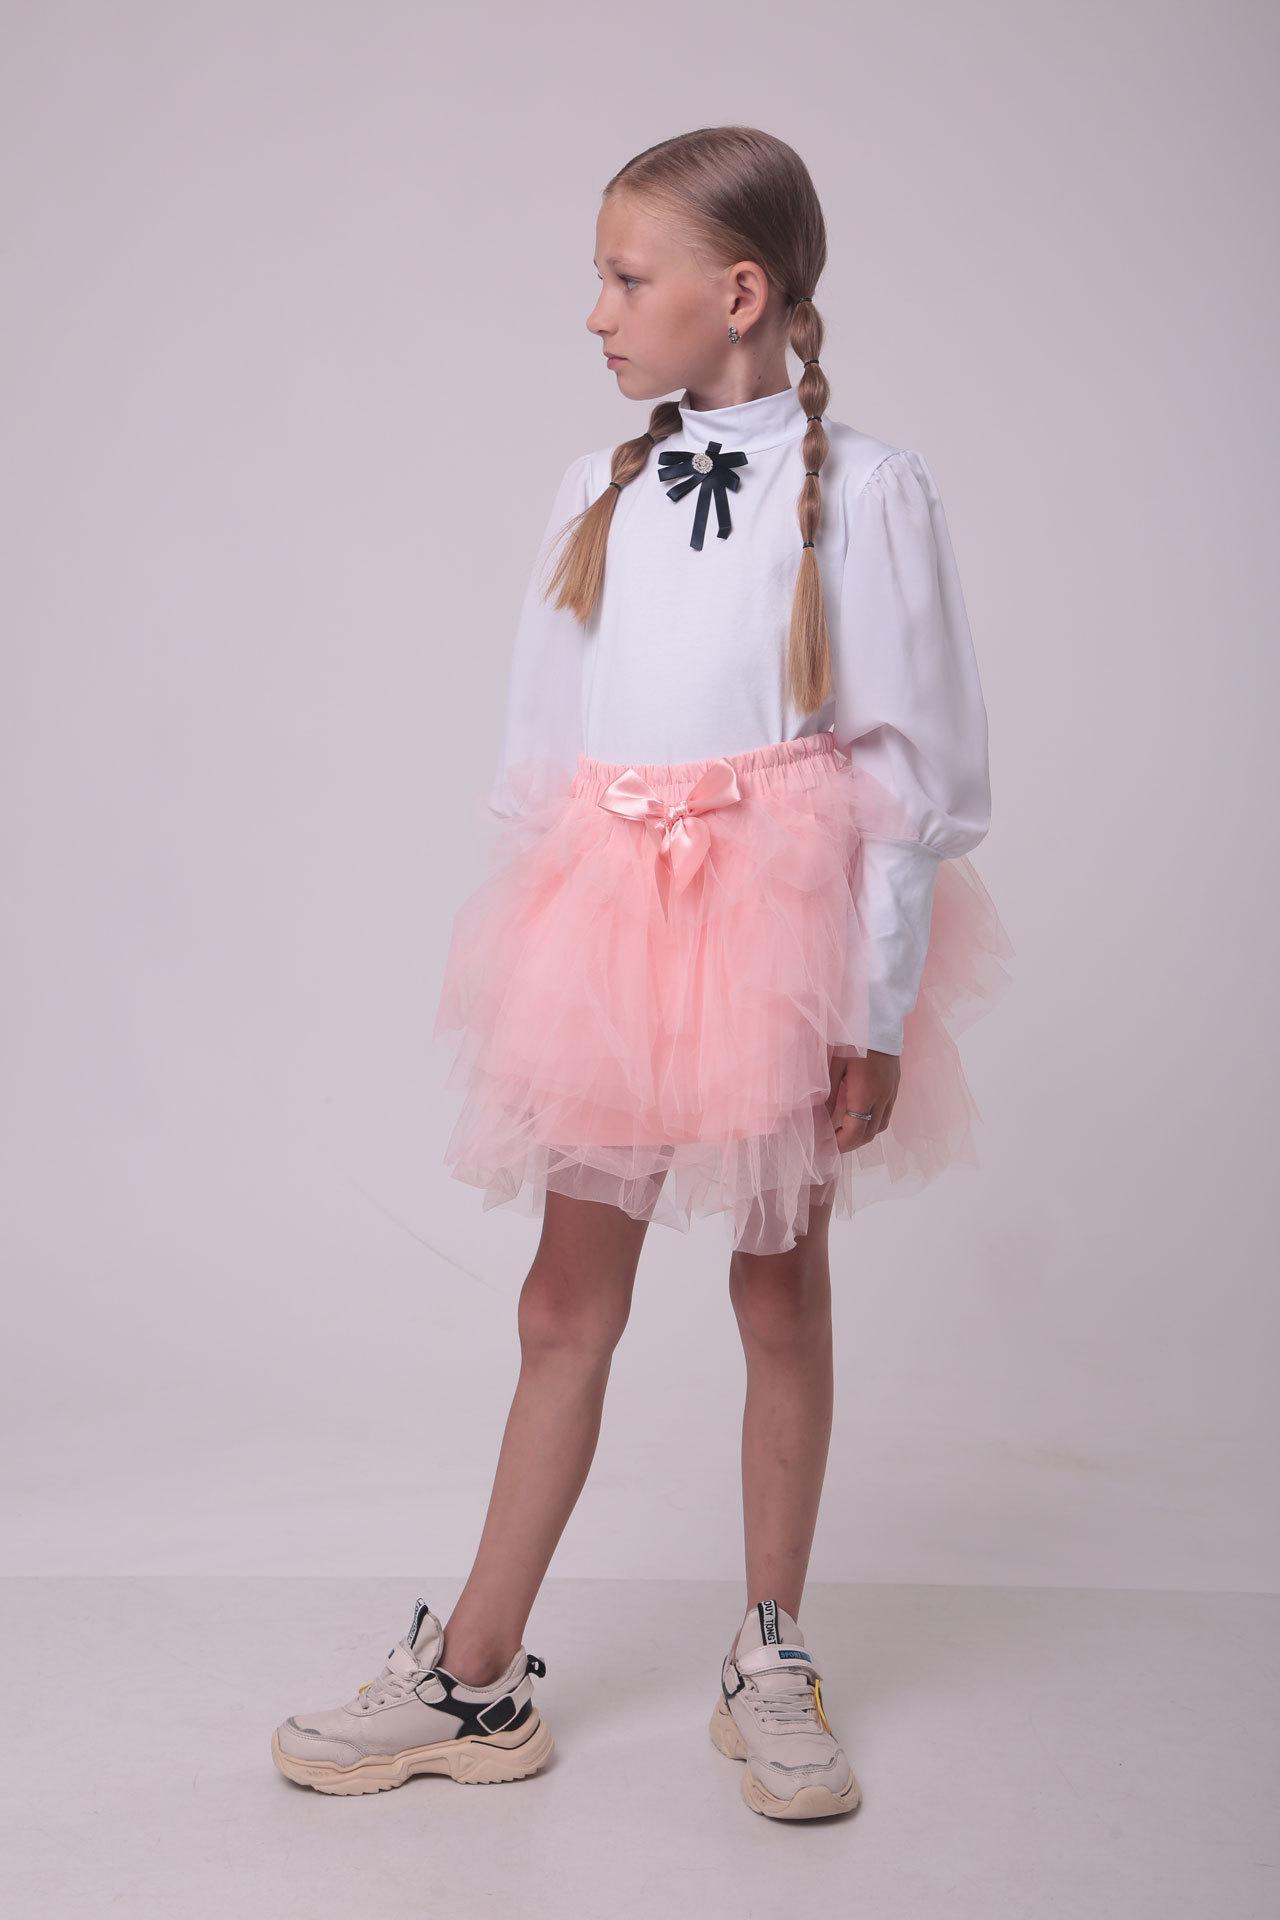 Блуза для девочки широкий рукав-фонарик Benini Турция, 9540 (140-176)